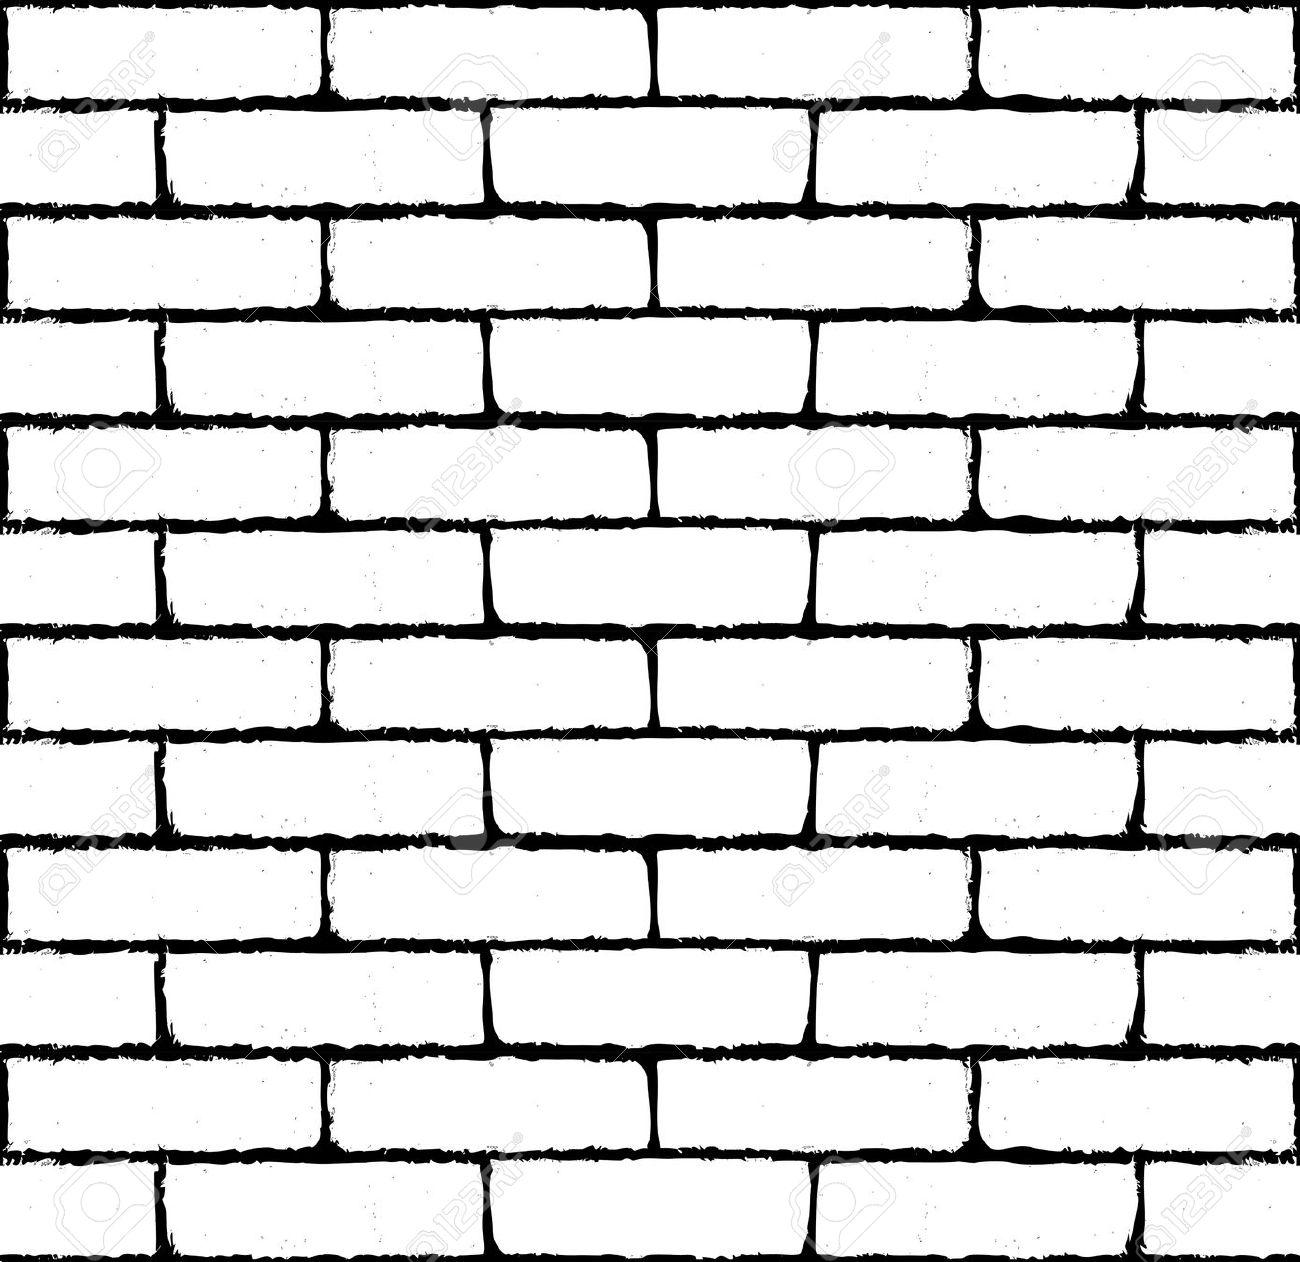 Black clipart brick wall Wall wall clipart silhouette Stone